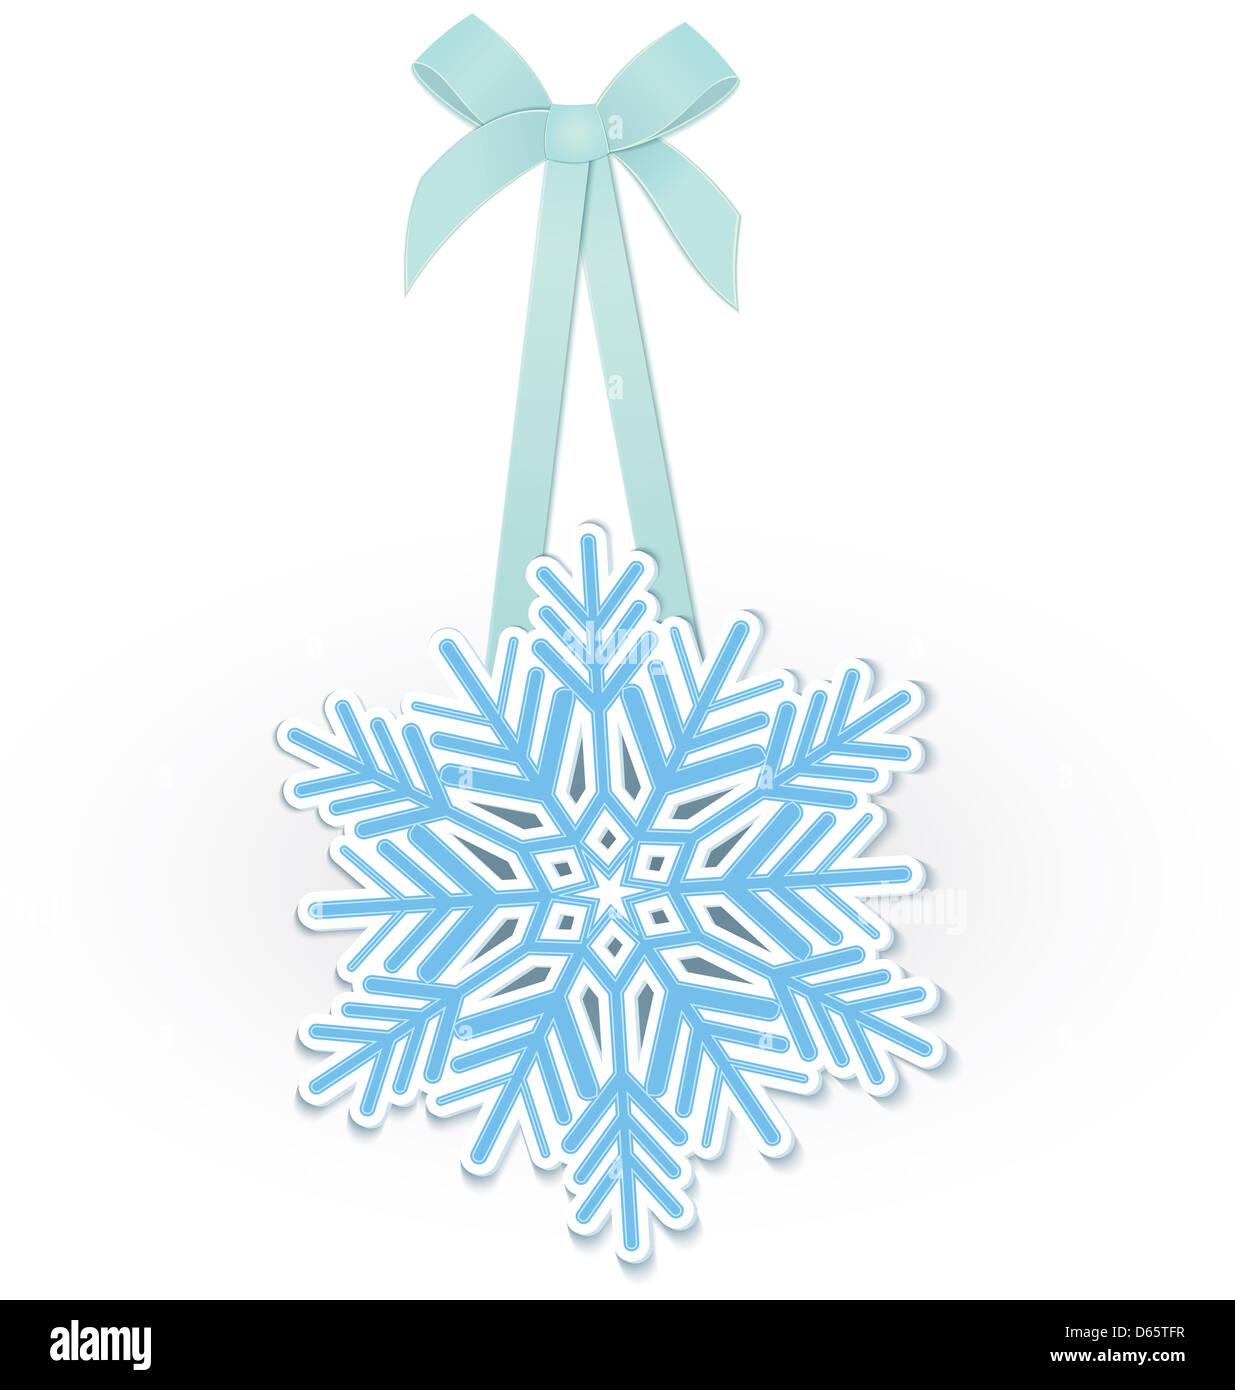 Snowflake on ribbon - Stock Image